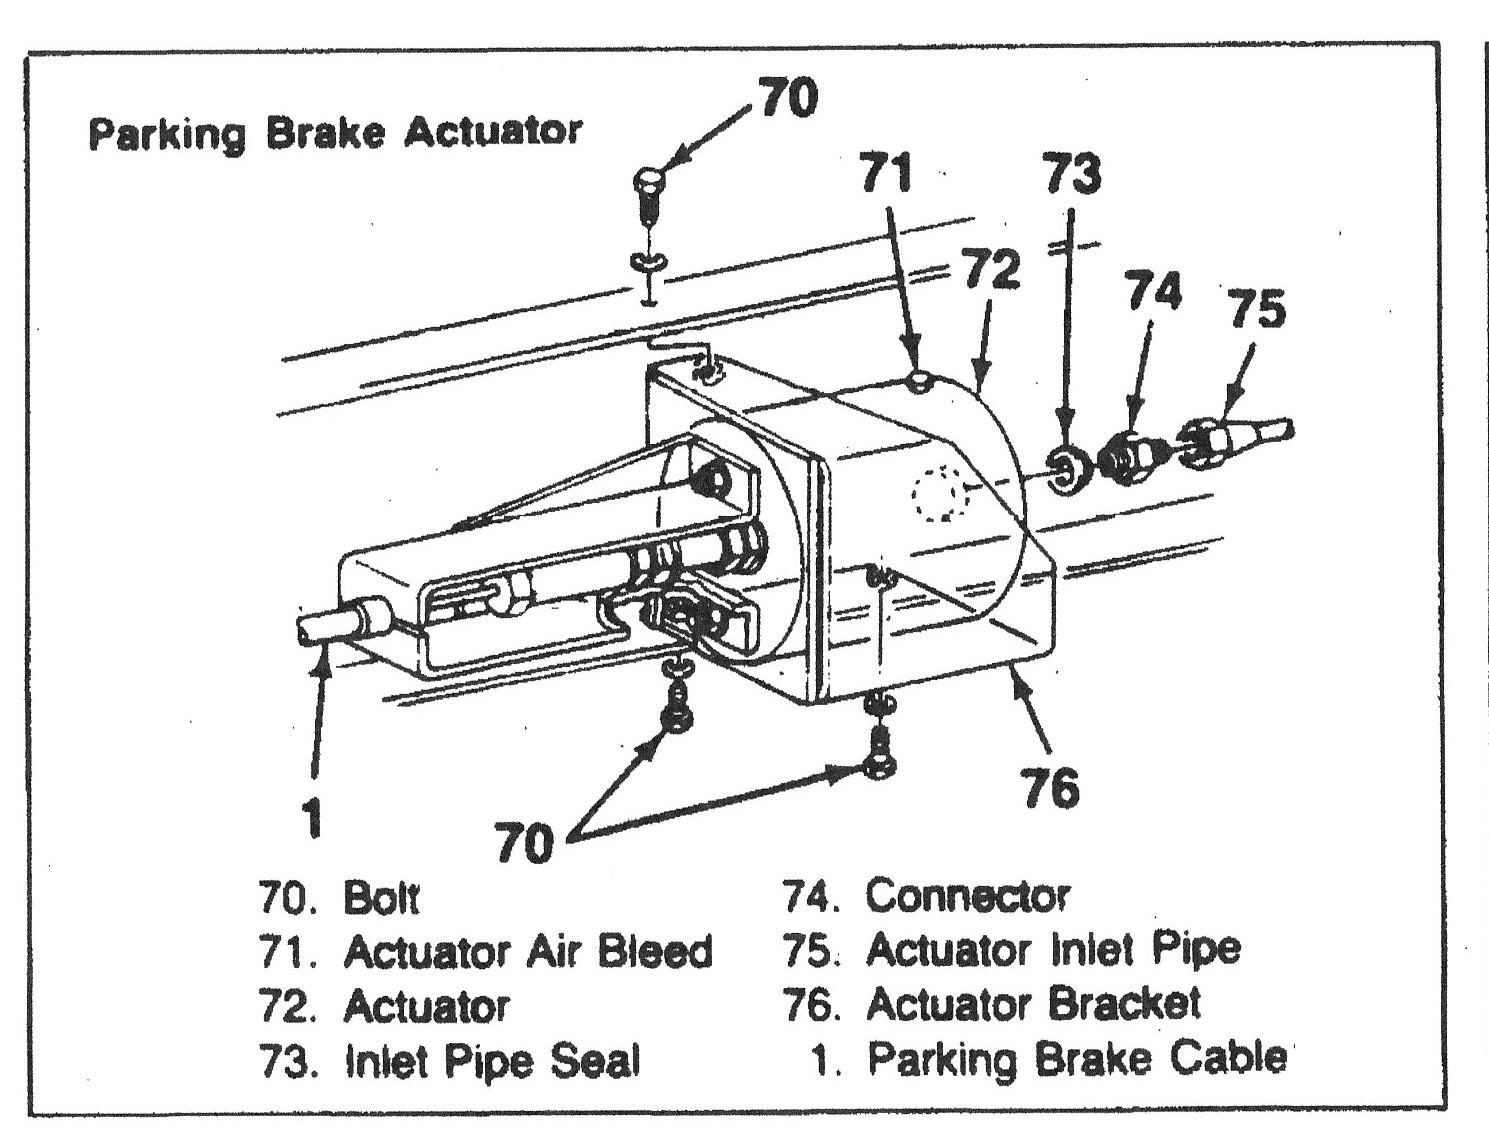 1999 fleetwood bounder wiring diagram